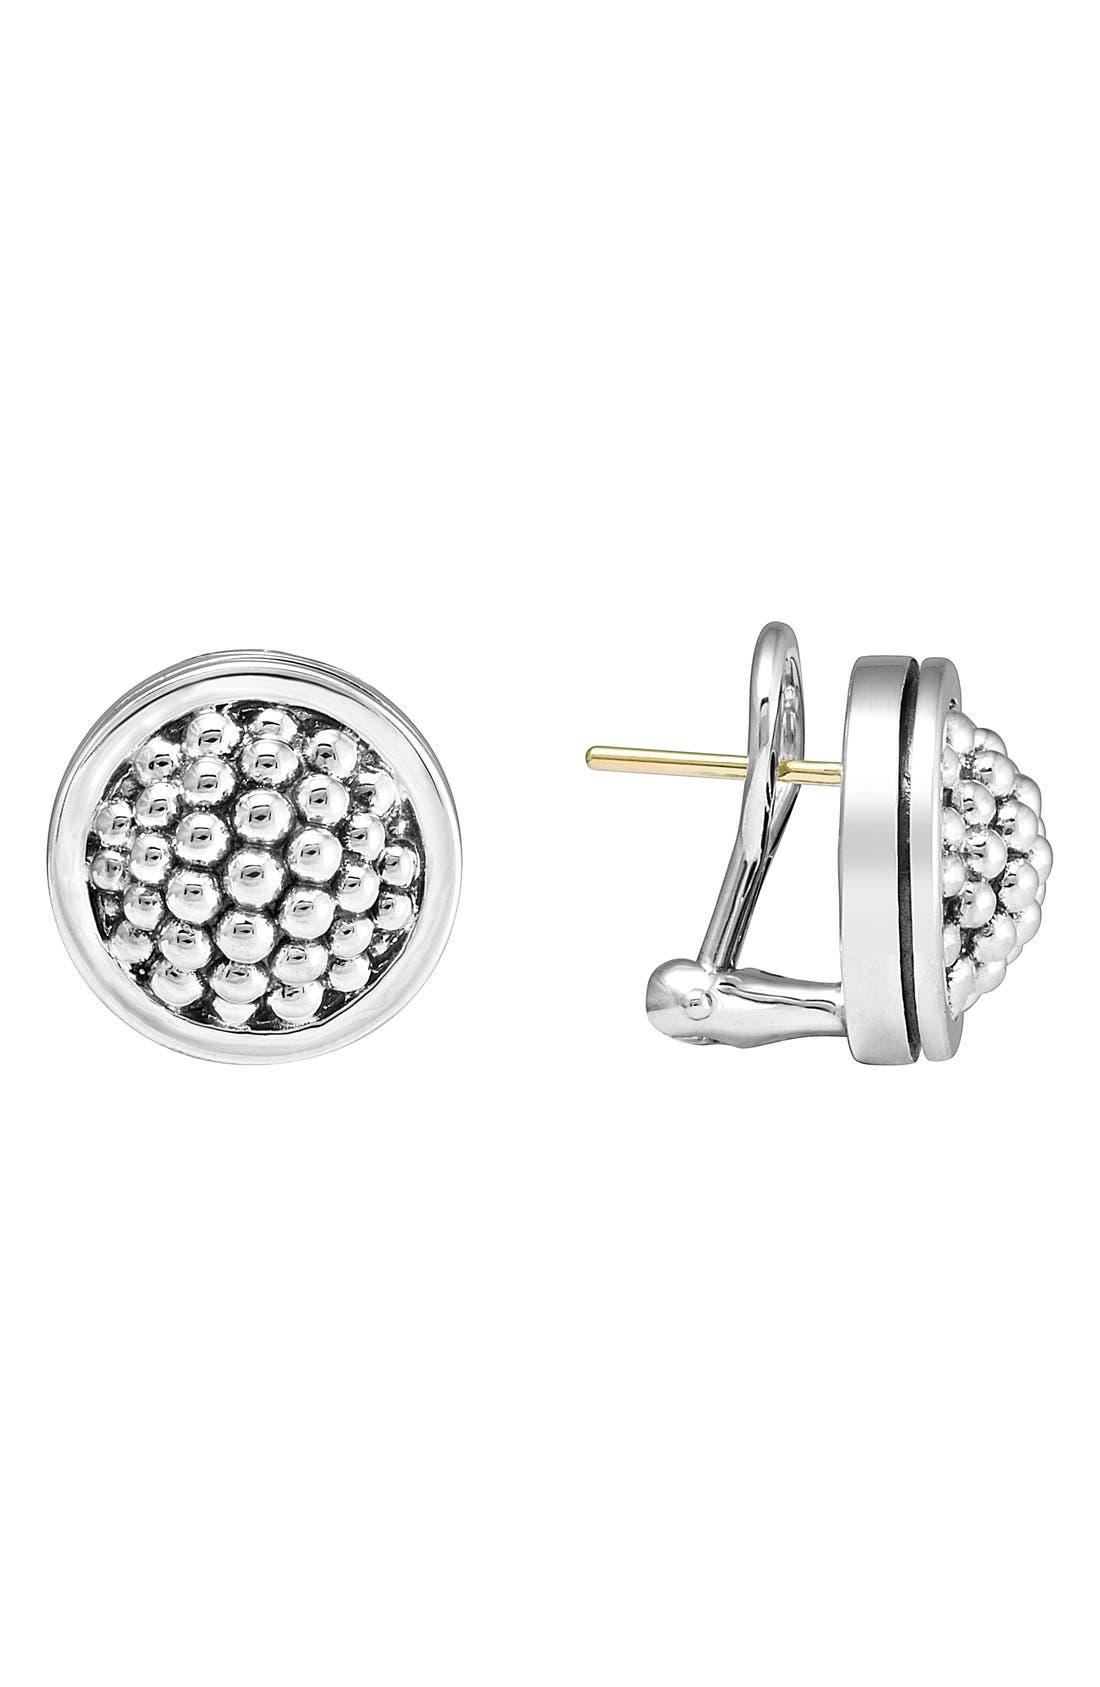 Caviar Stud Earrings,                         Main,                         color, STERLING SILVER